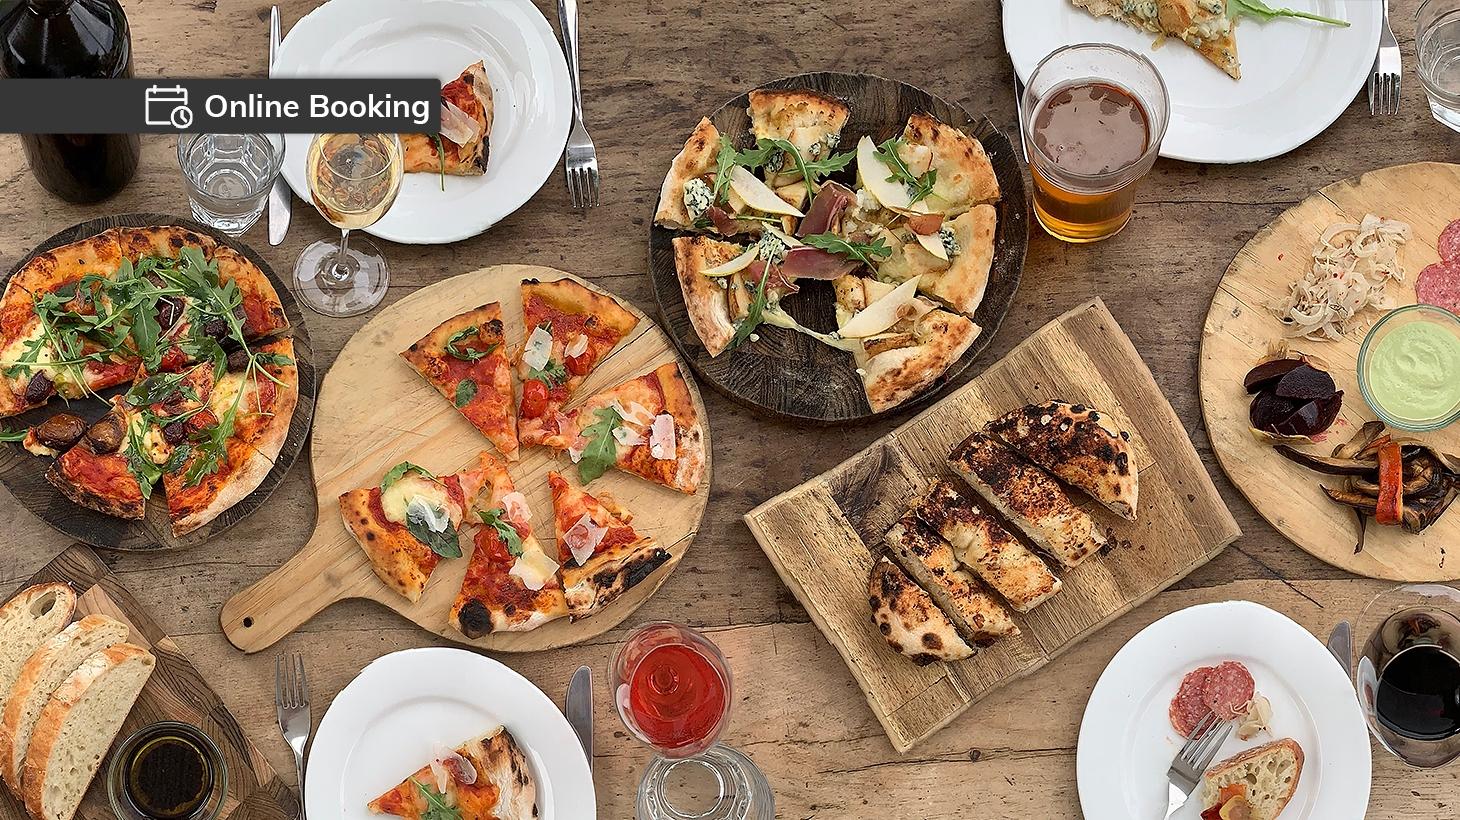 grazing menu item, pizza, wine tasting and glass of wine